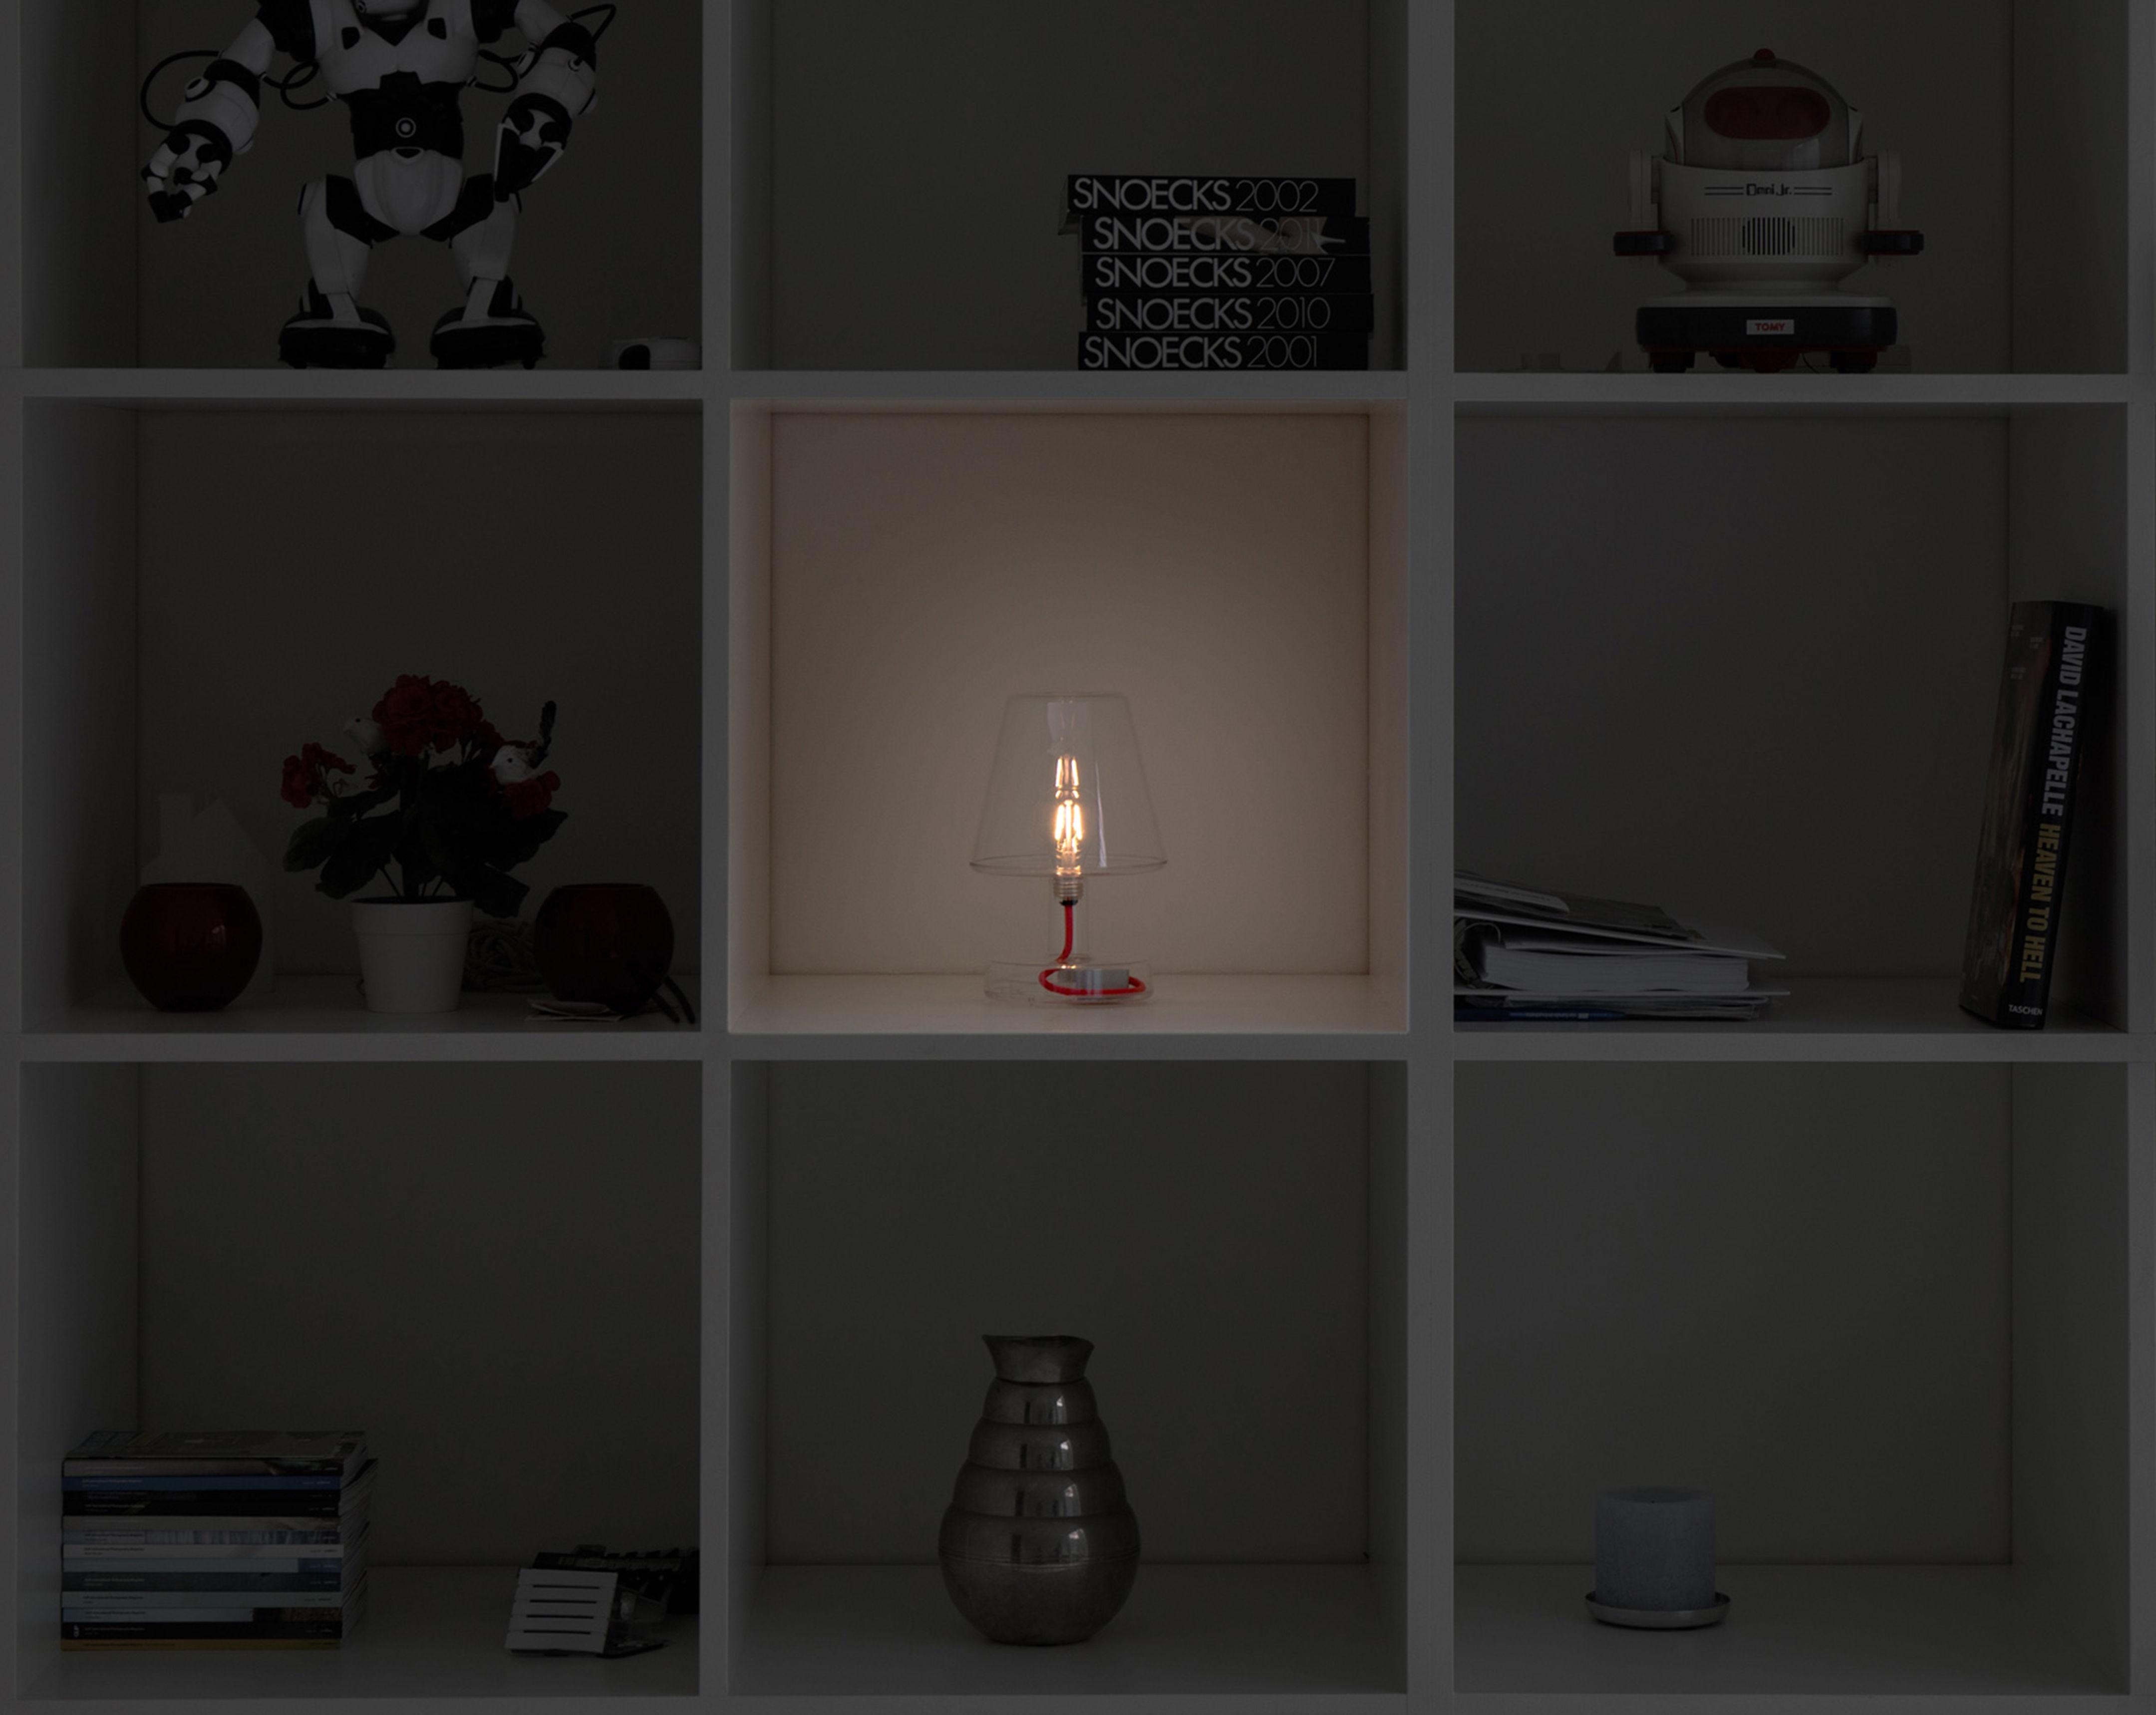 Lampe ohne kabel transloetje von fatboy transparent farblos h